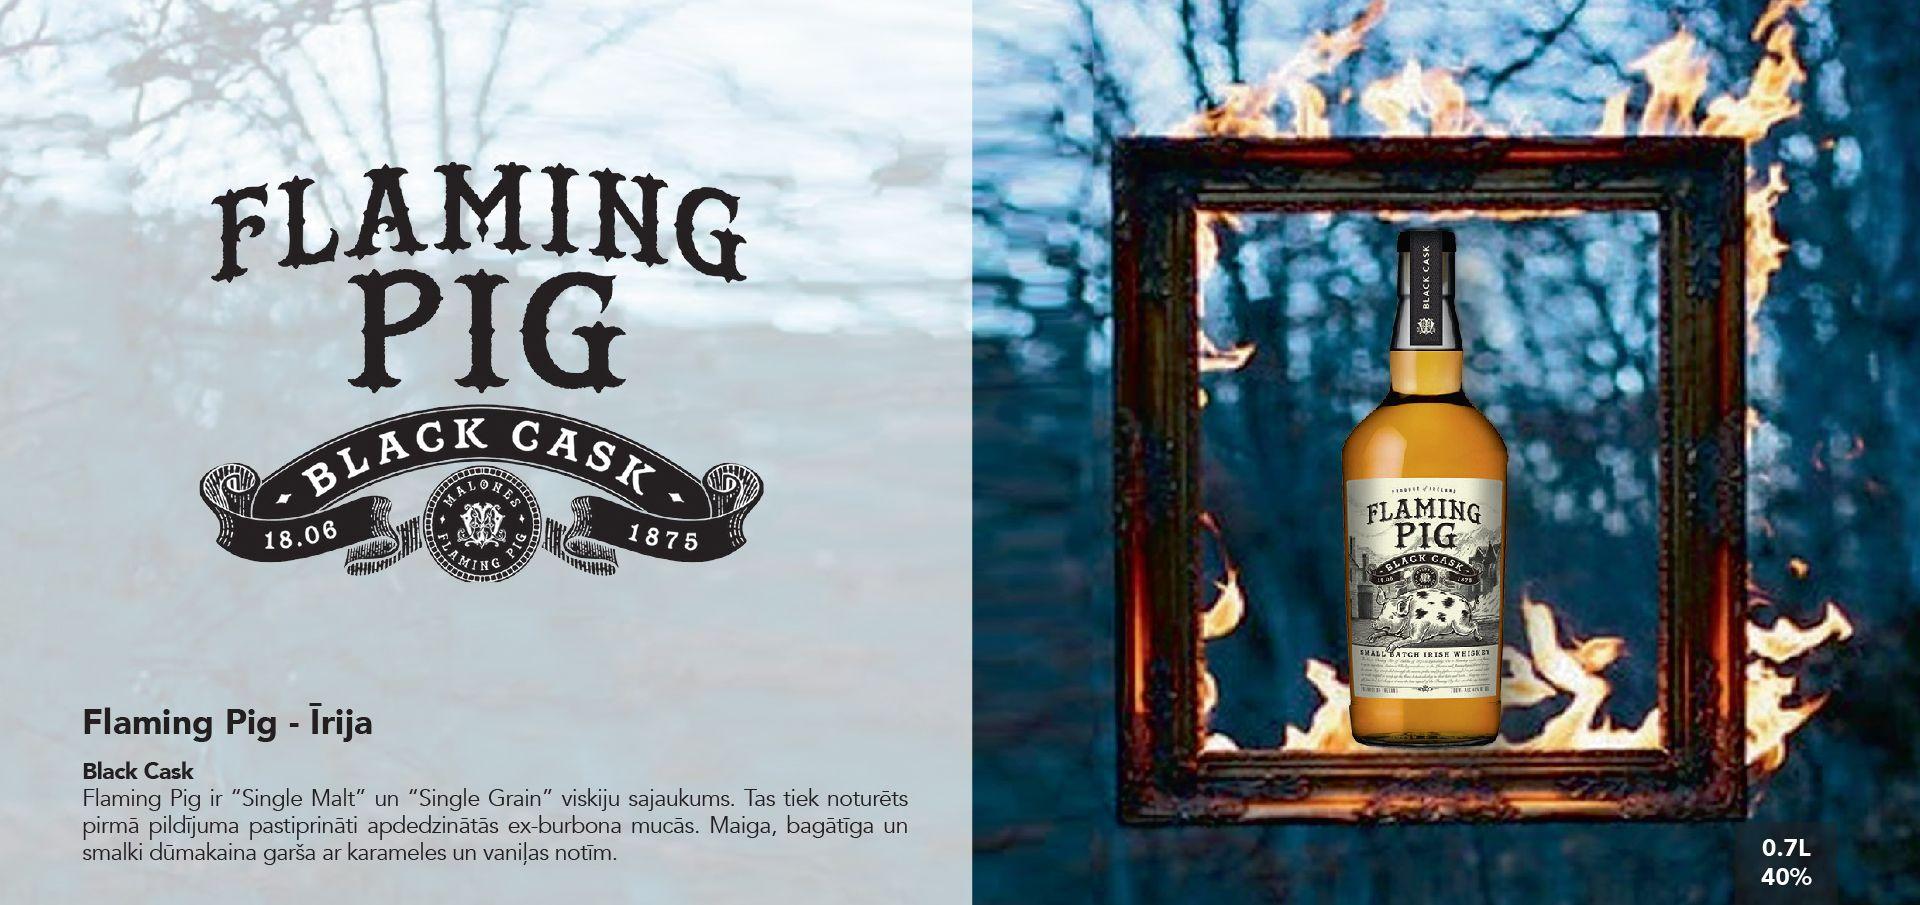 Flaming Pig Whiskey - Īrija